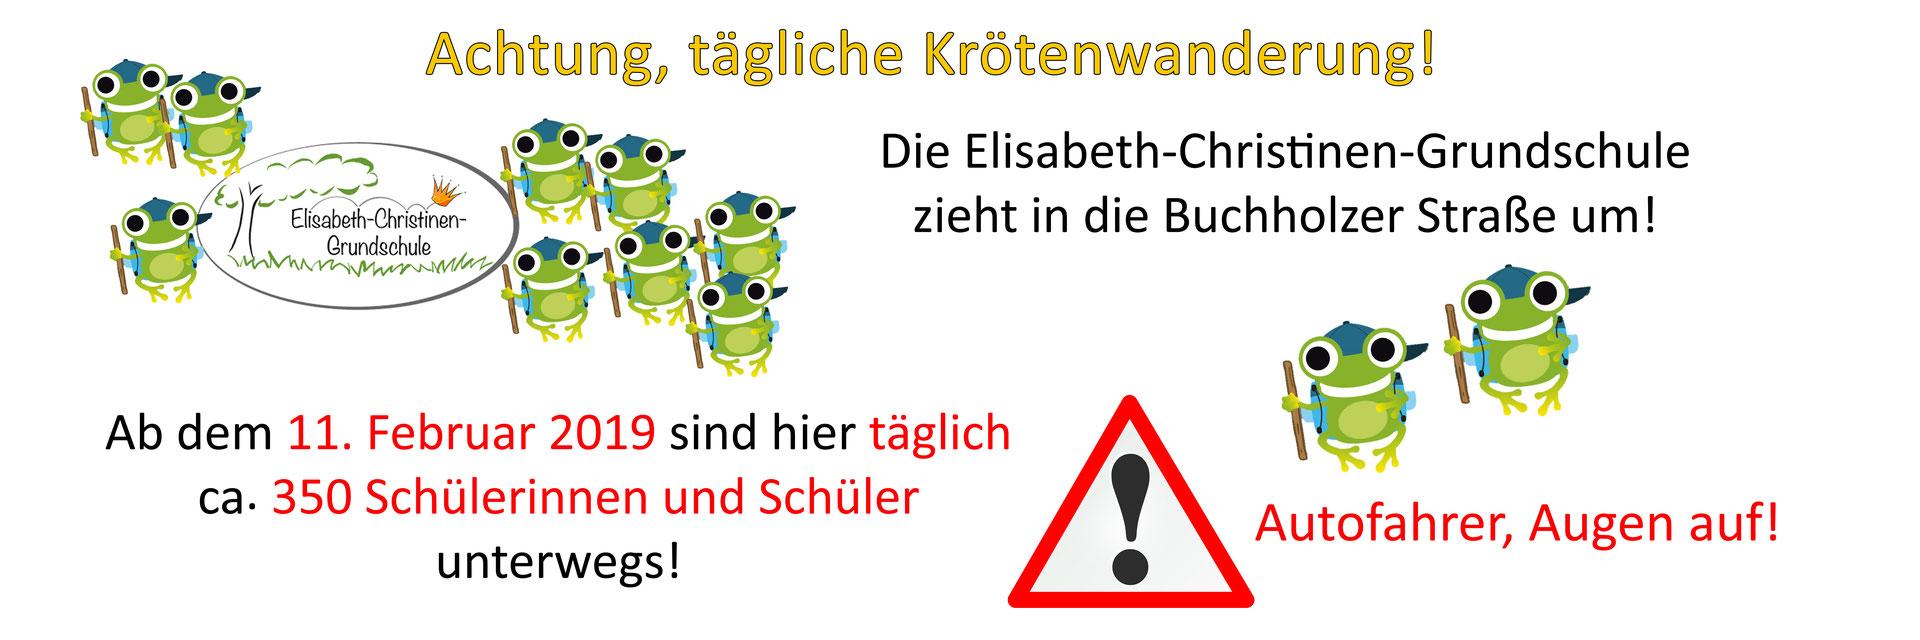 elisabeth christinen grundschule